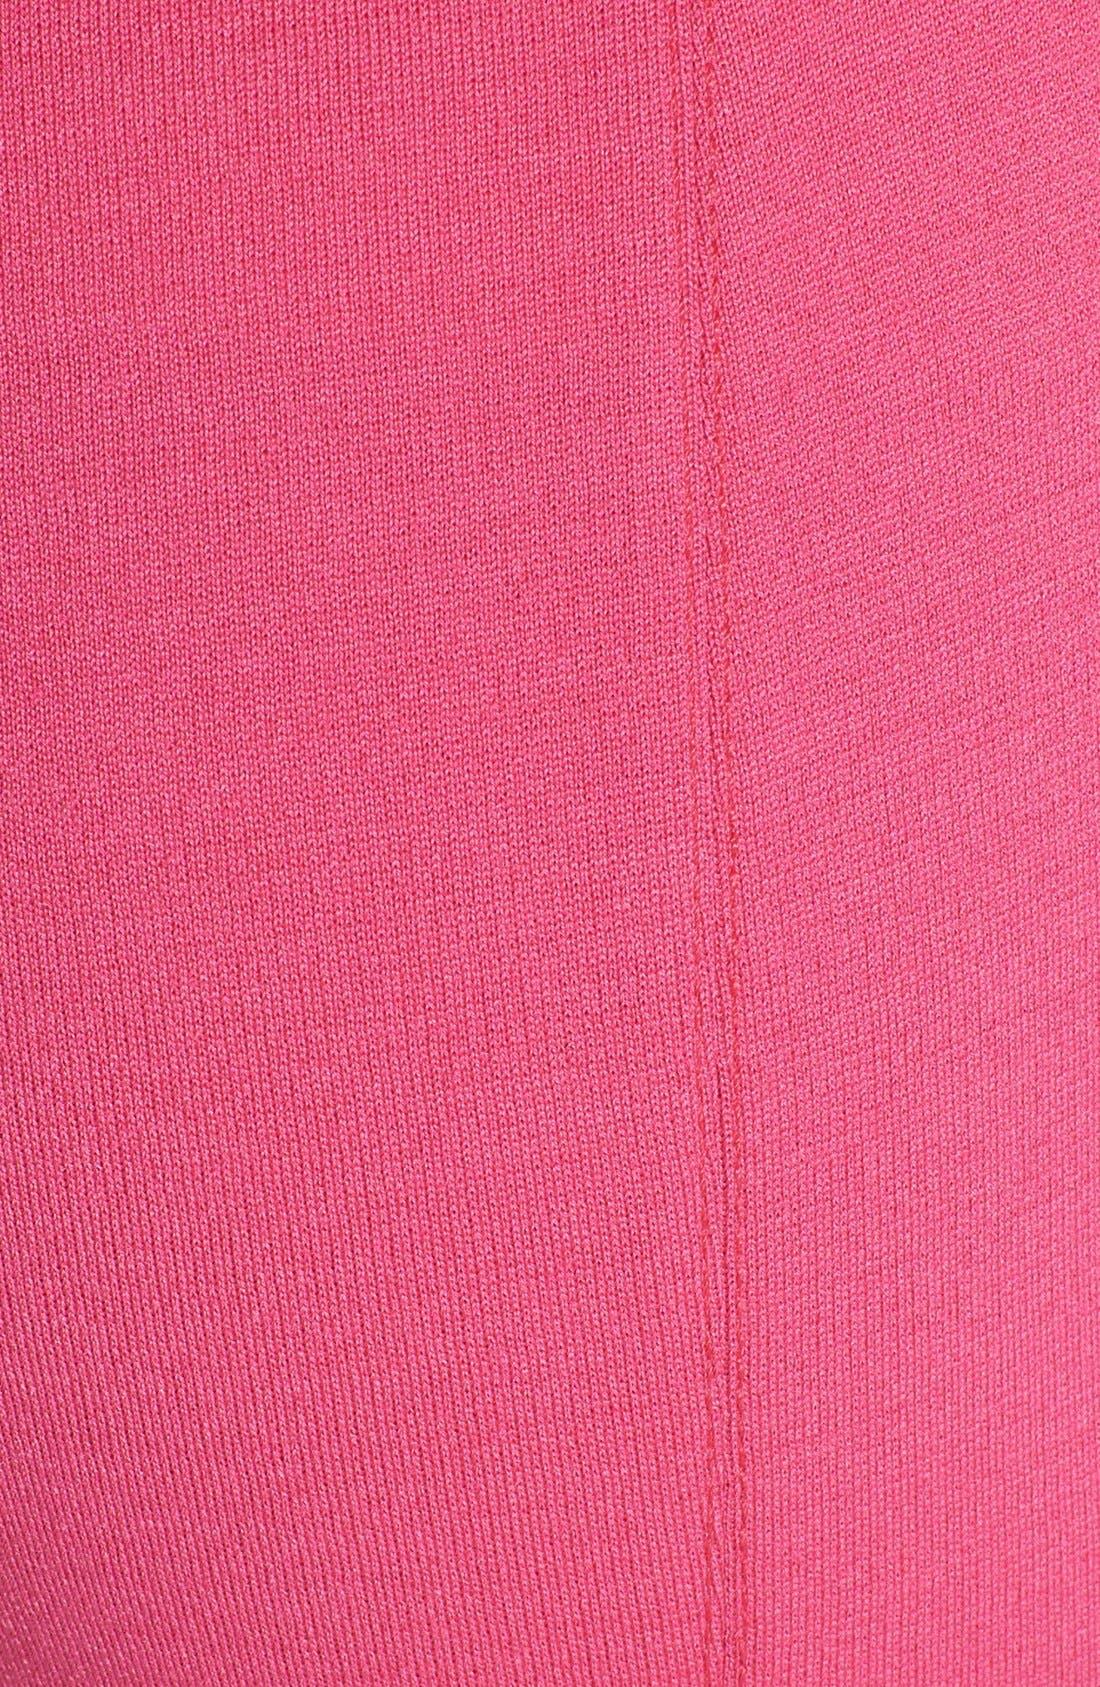 Alternate Image 5  - St. John Collection 'Alexa' Stretch Milano Knit Pants